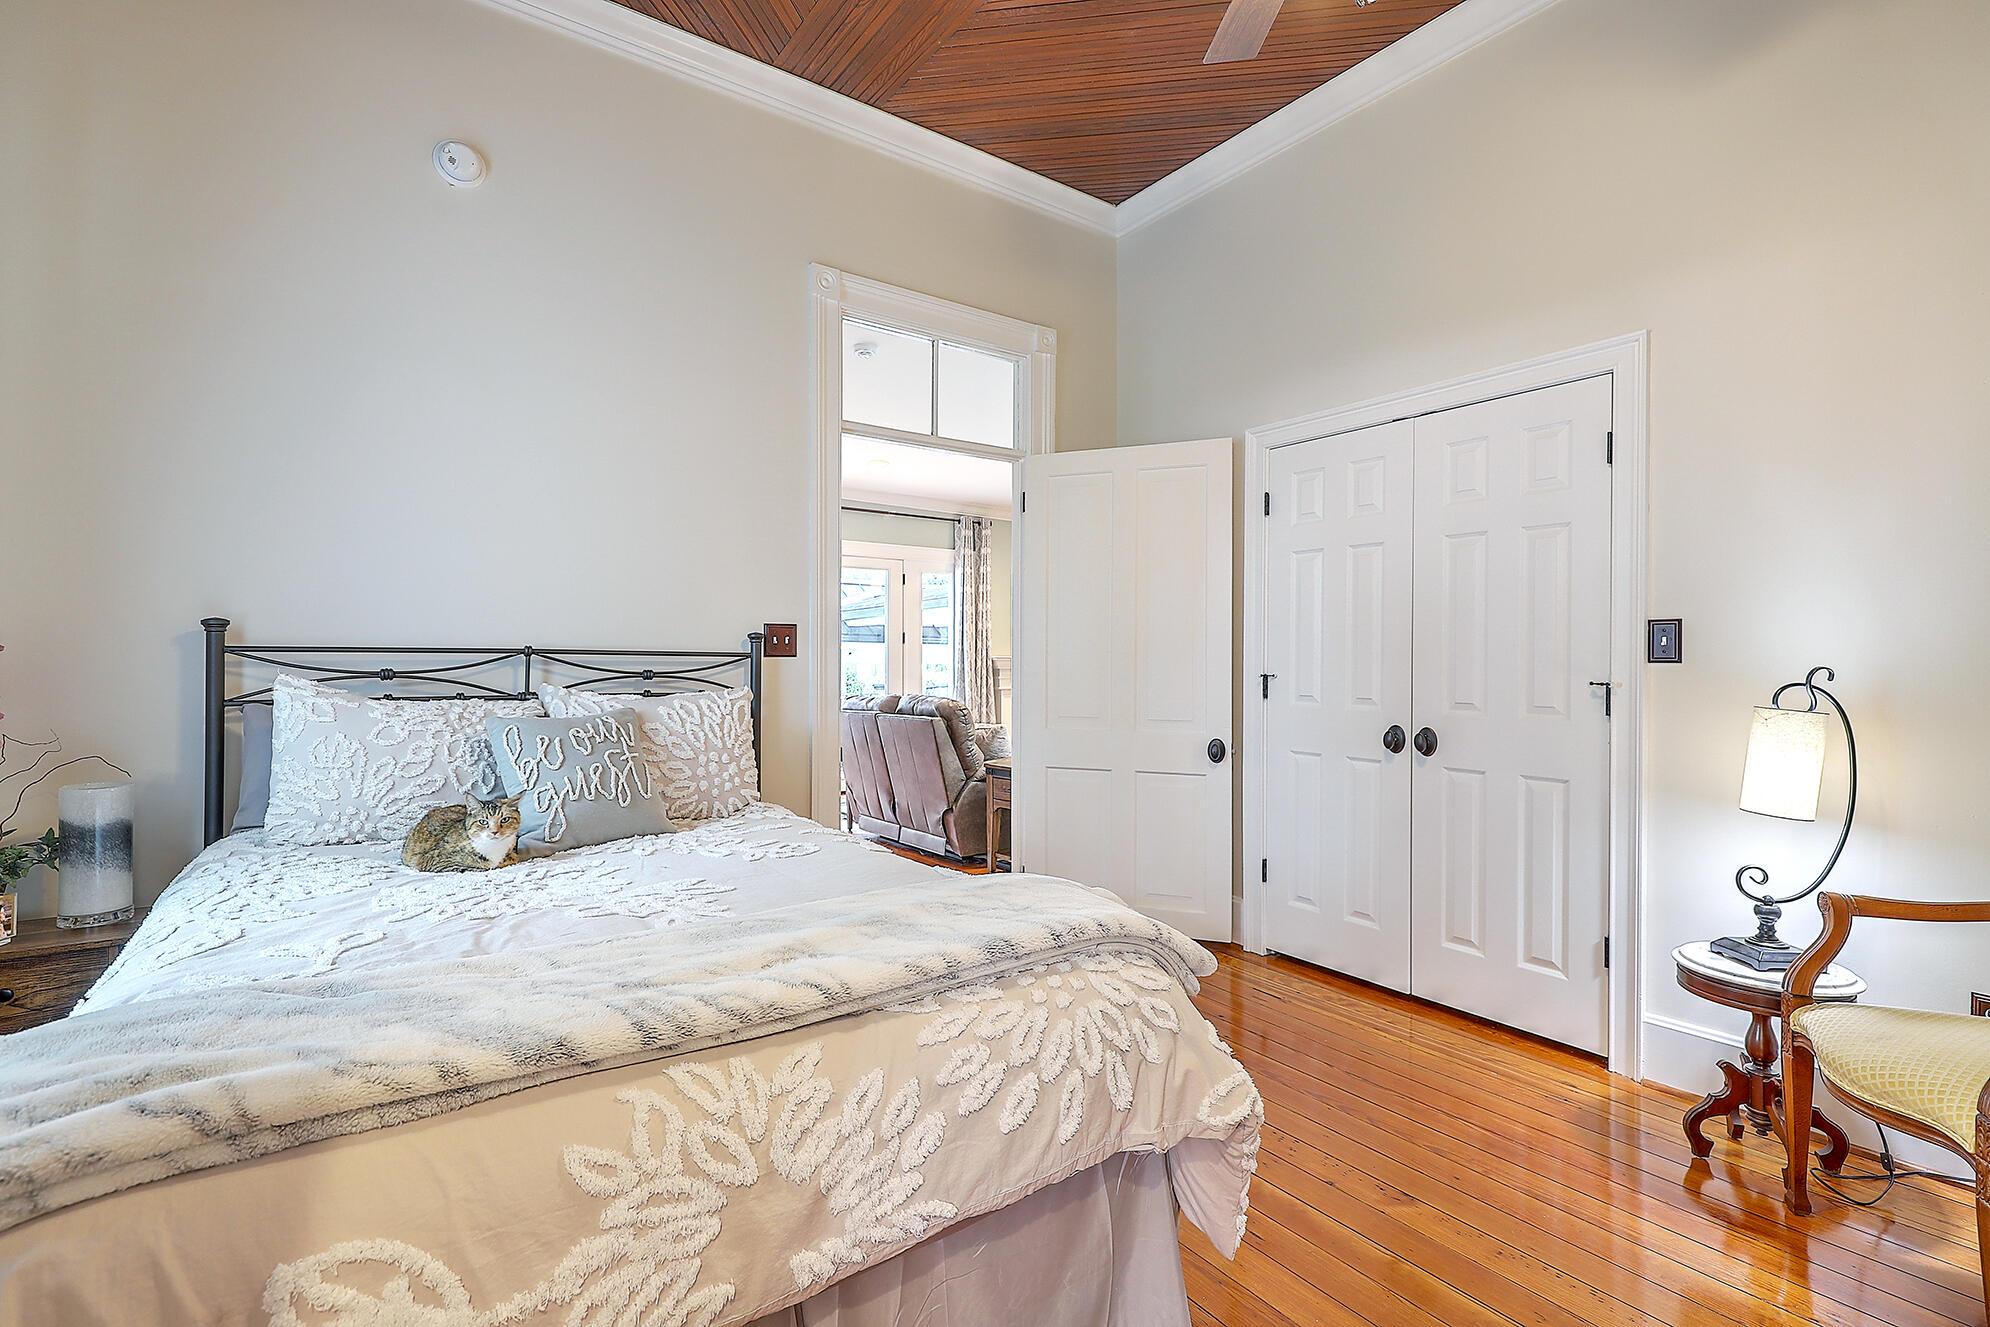 Summerville Homes For Sale - 102 Hickory, Summerville, SC - 24